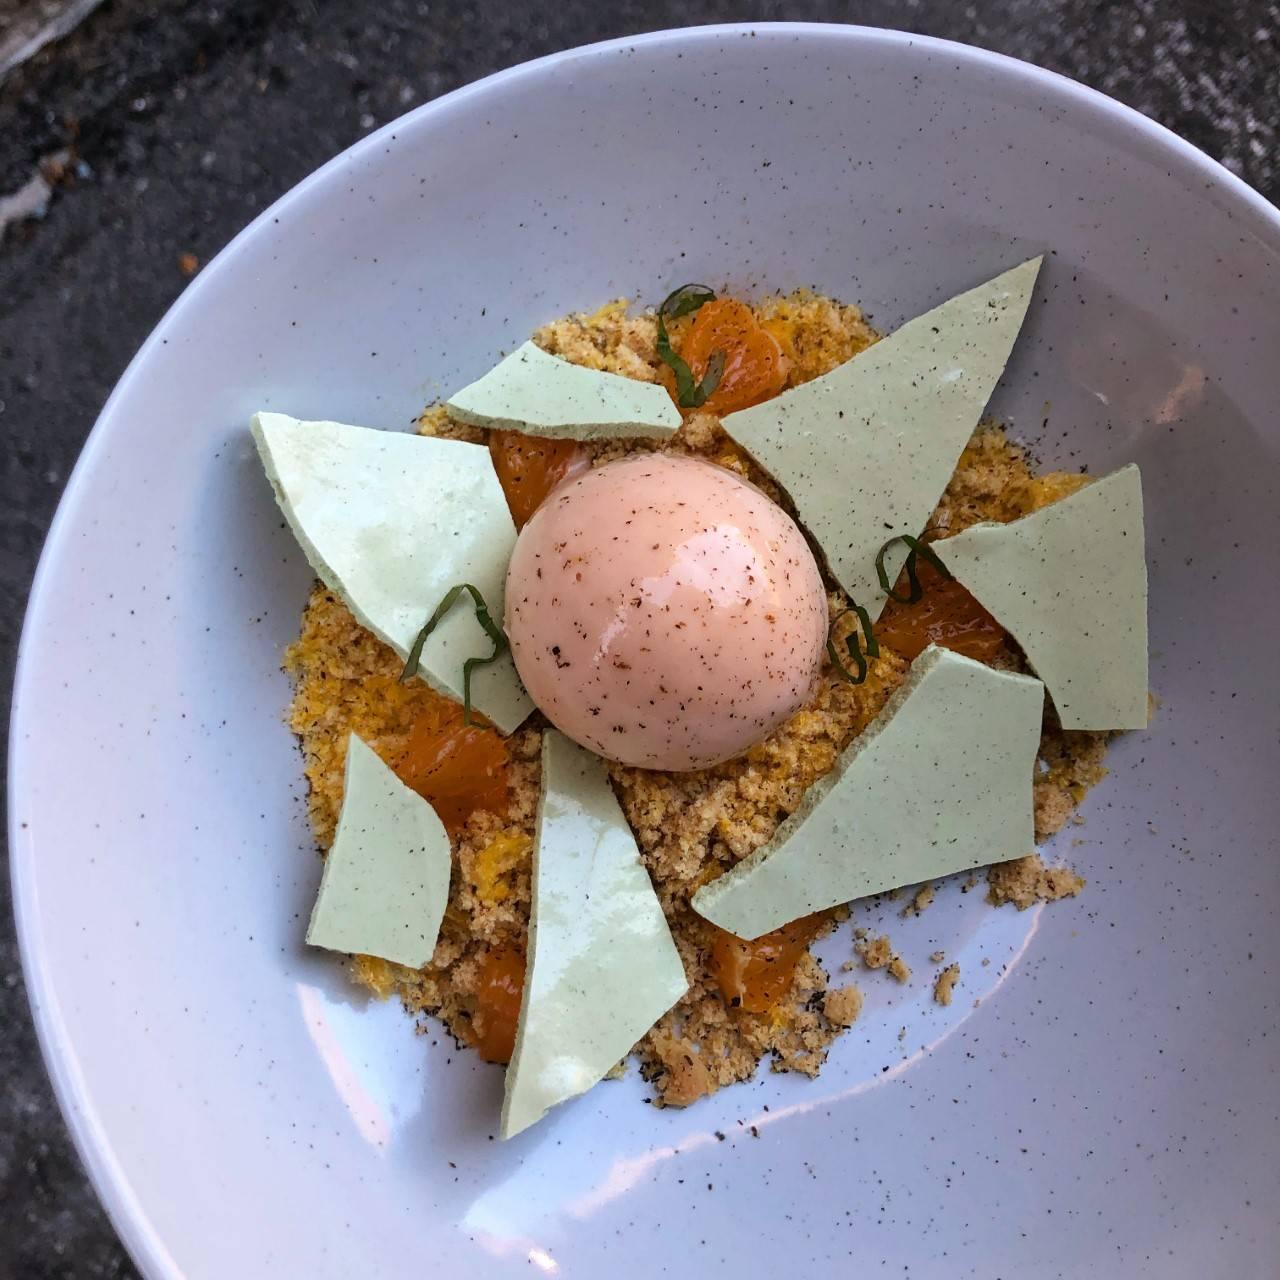 Harmony Cuisine Saint Julien momotaro restaurant - chicago, il | opentable